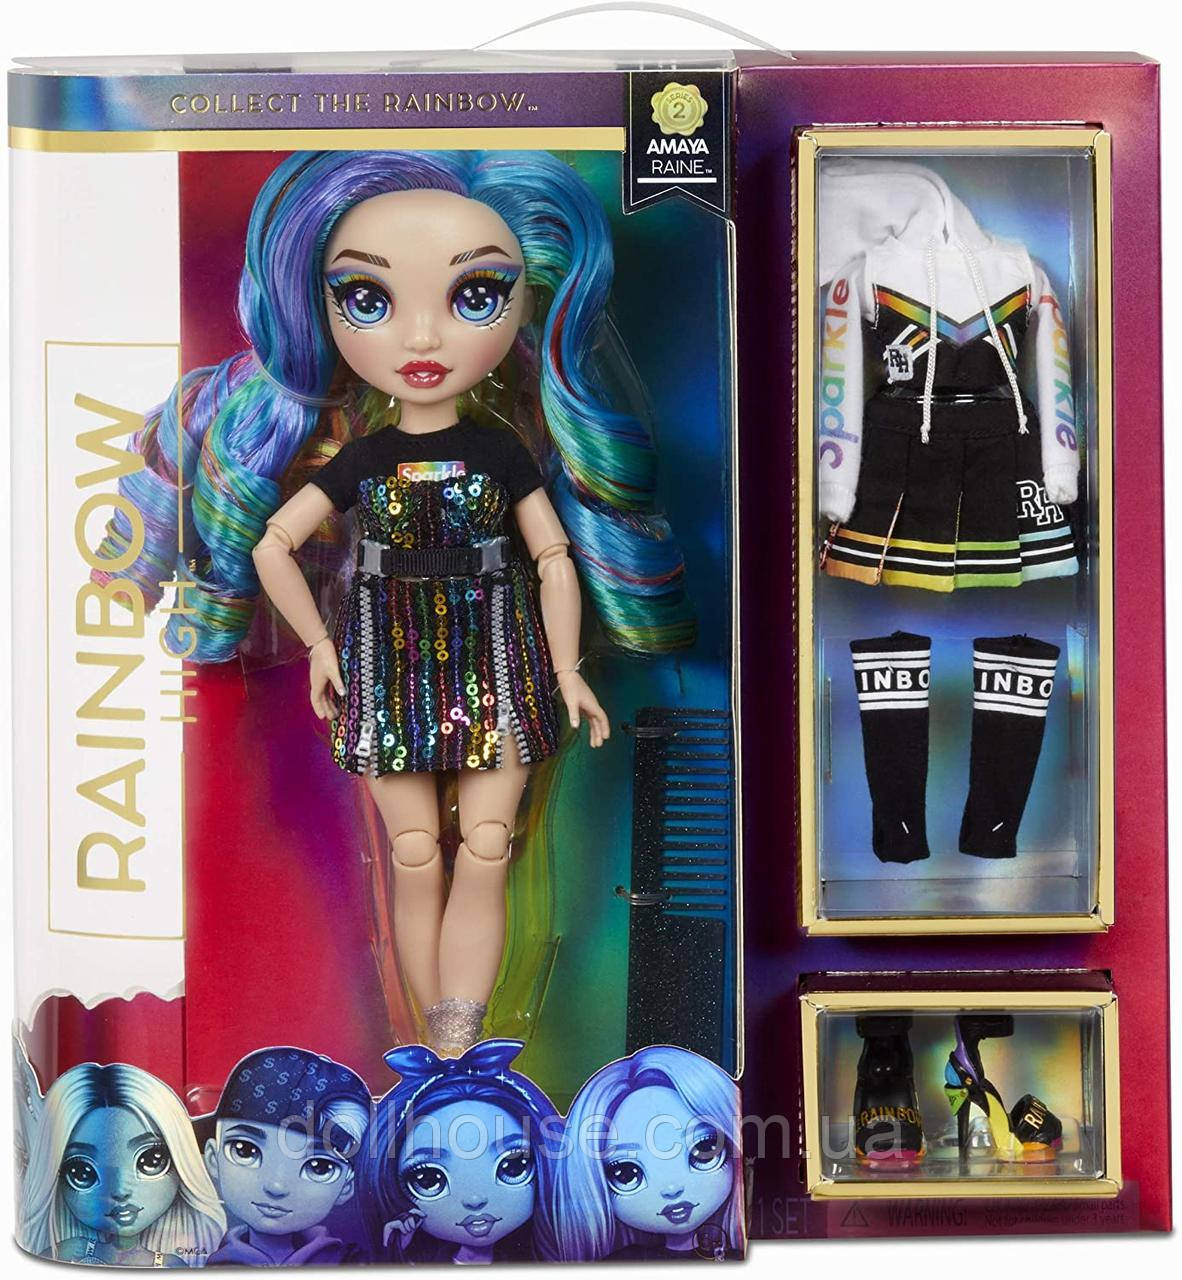 Кукла Rainbow High S2 - Амая Рэин Amaya Raine Лялька Рейнбоу Хай 2